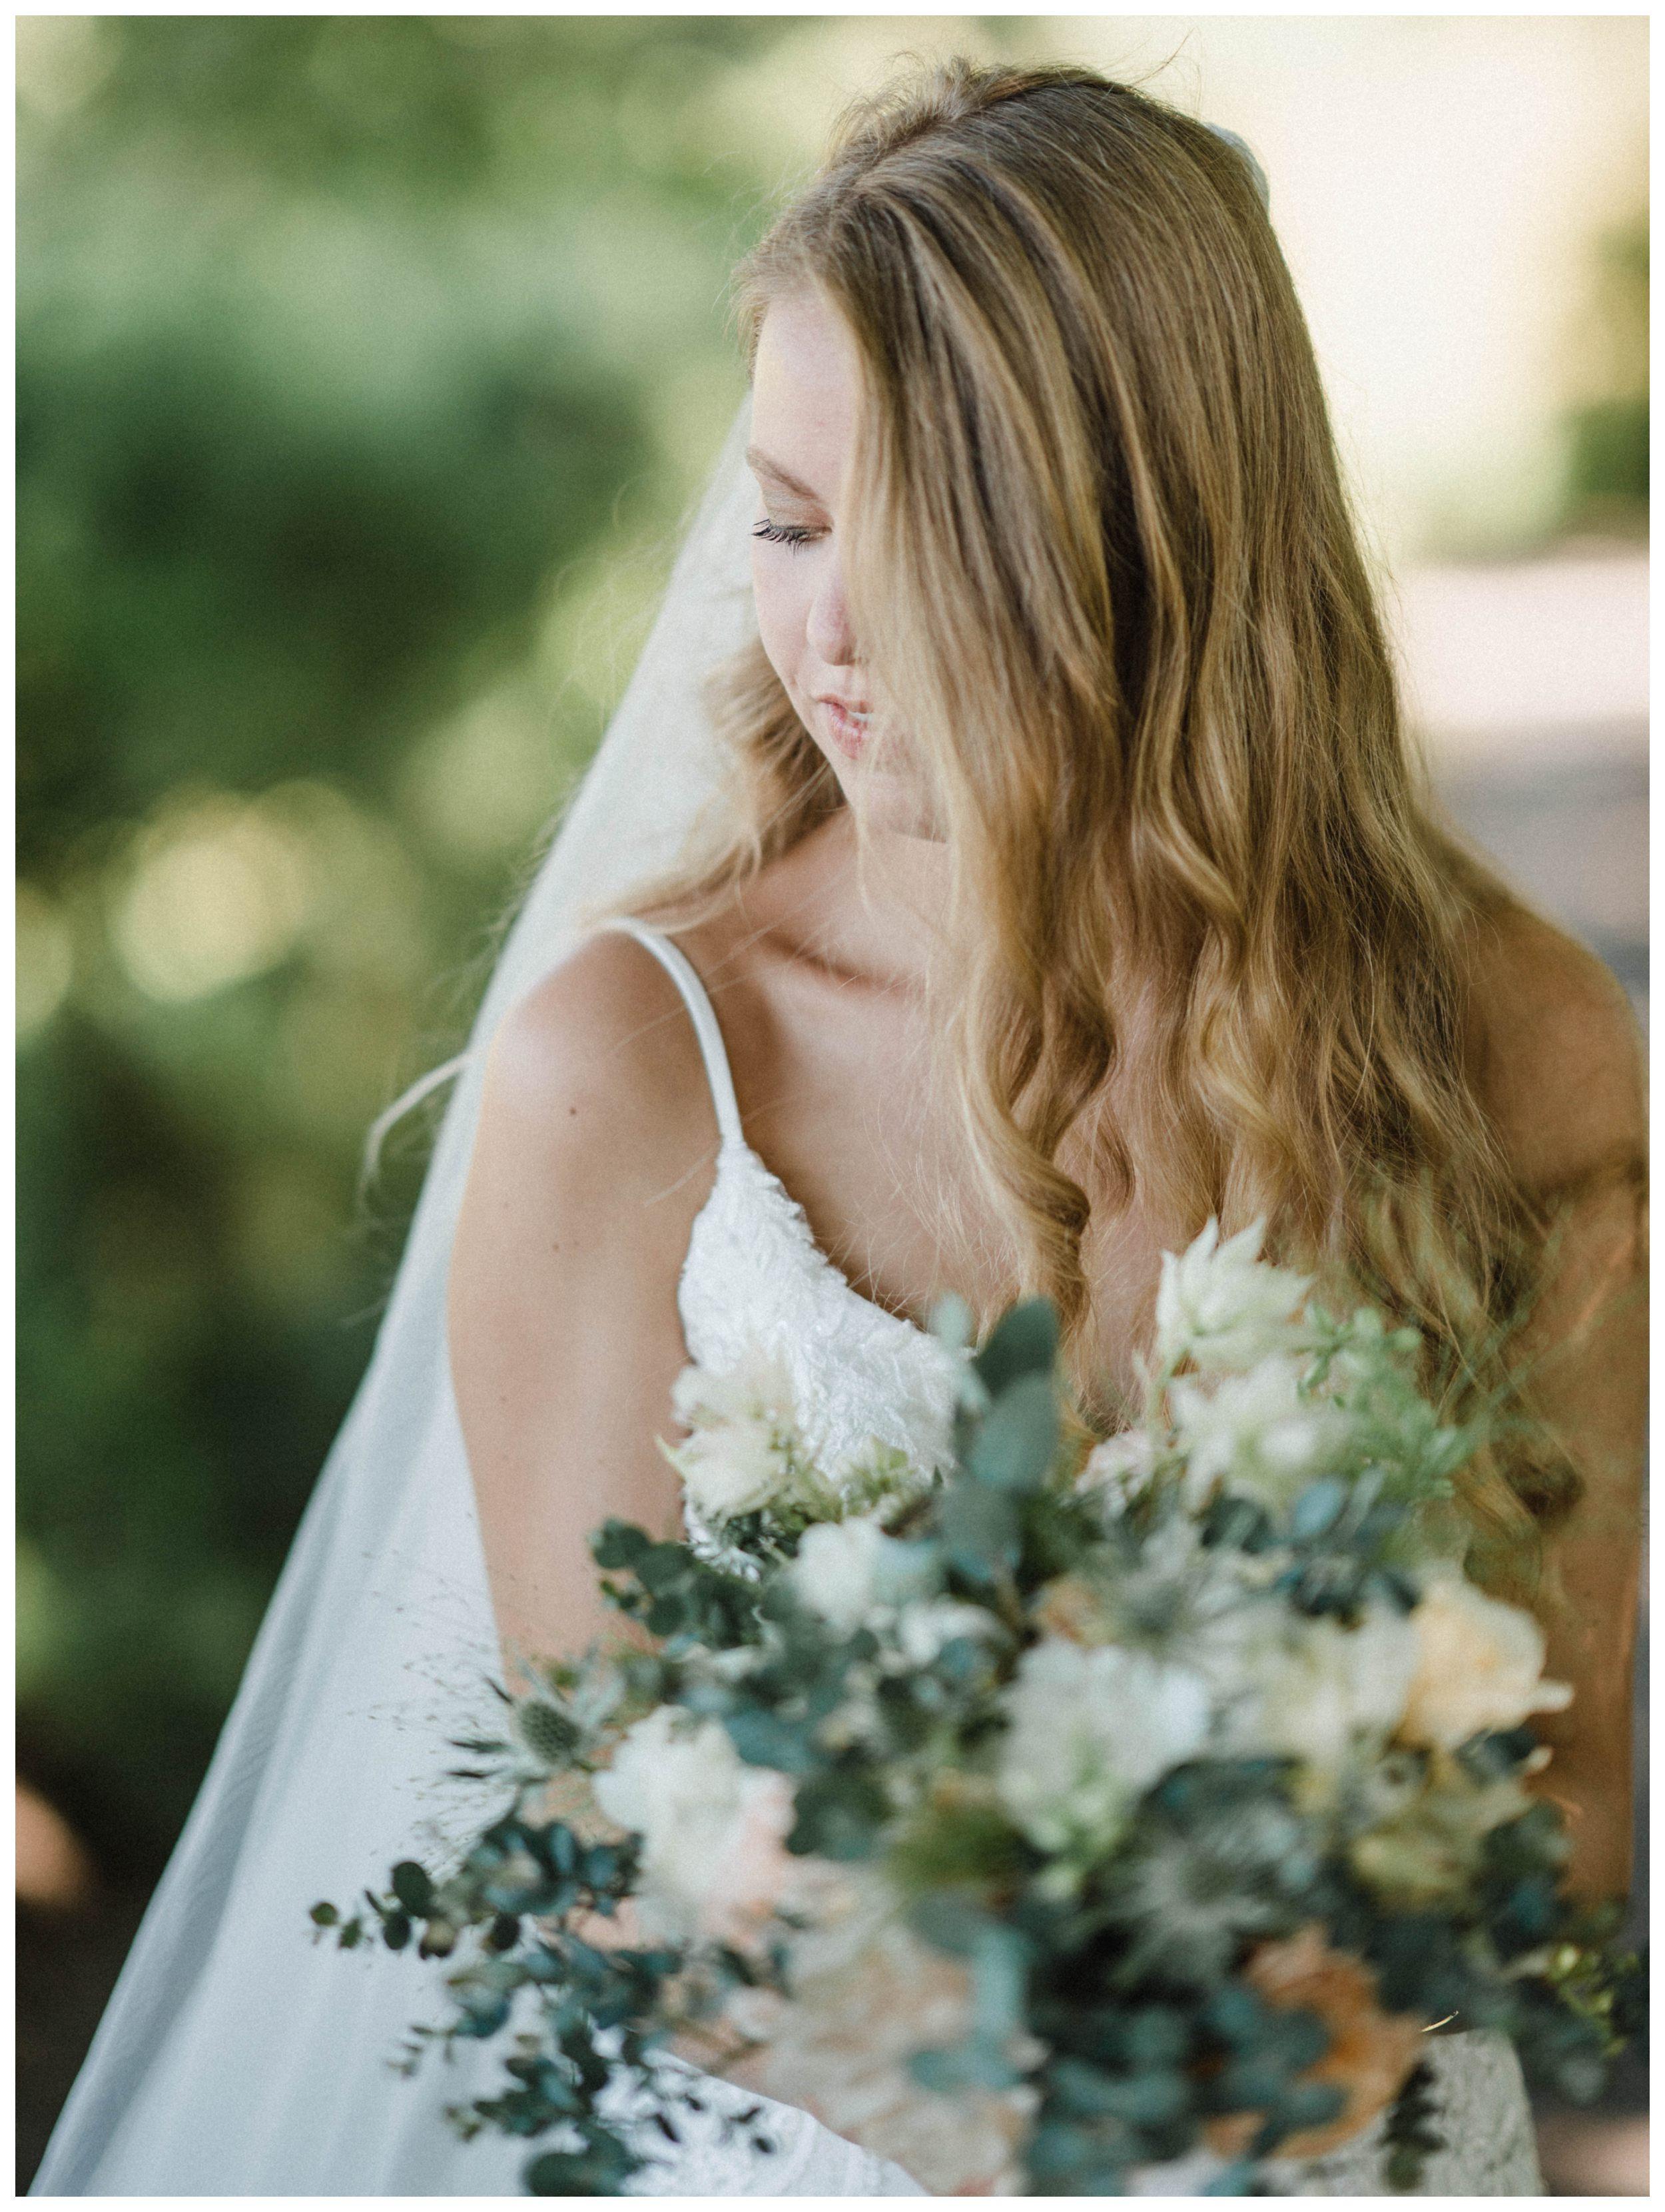 huwelijksfotograaf bruidsfotograaf destinationwedding huwelijksfotografie in ardennen nederland (64).jpg